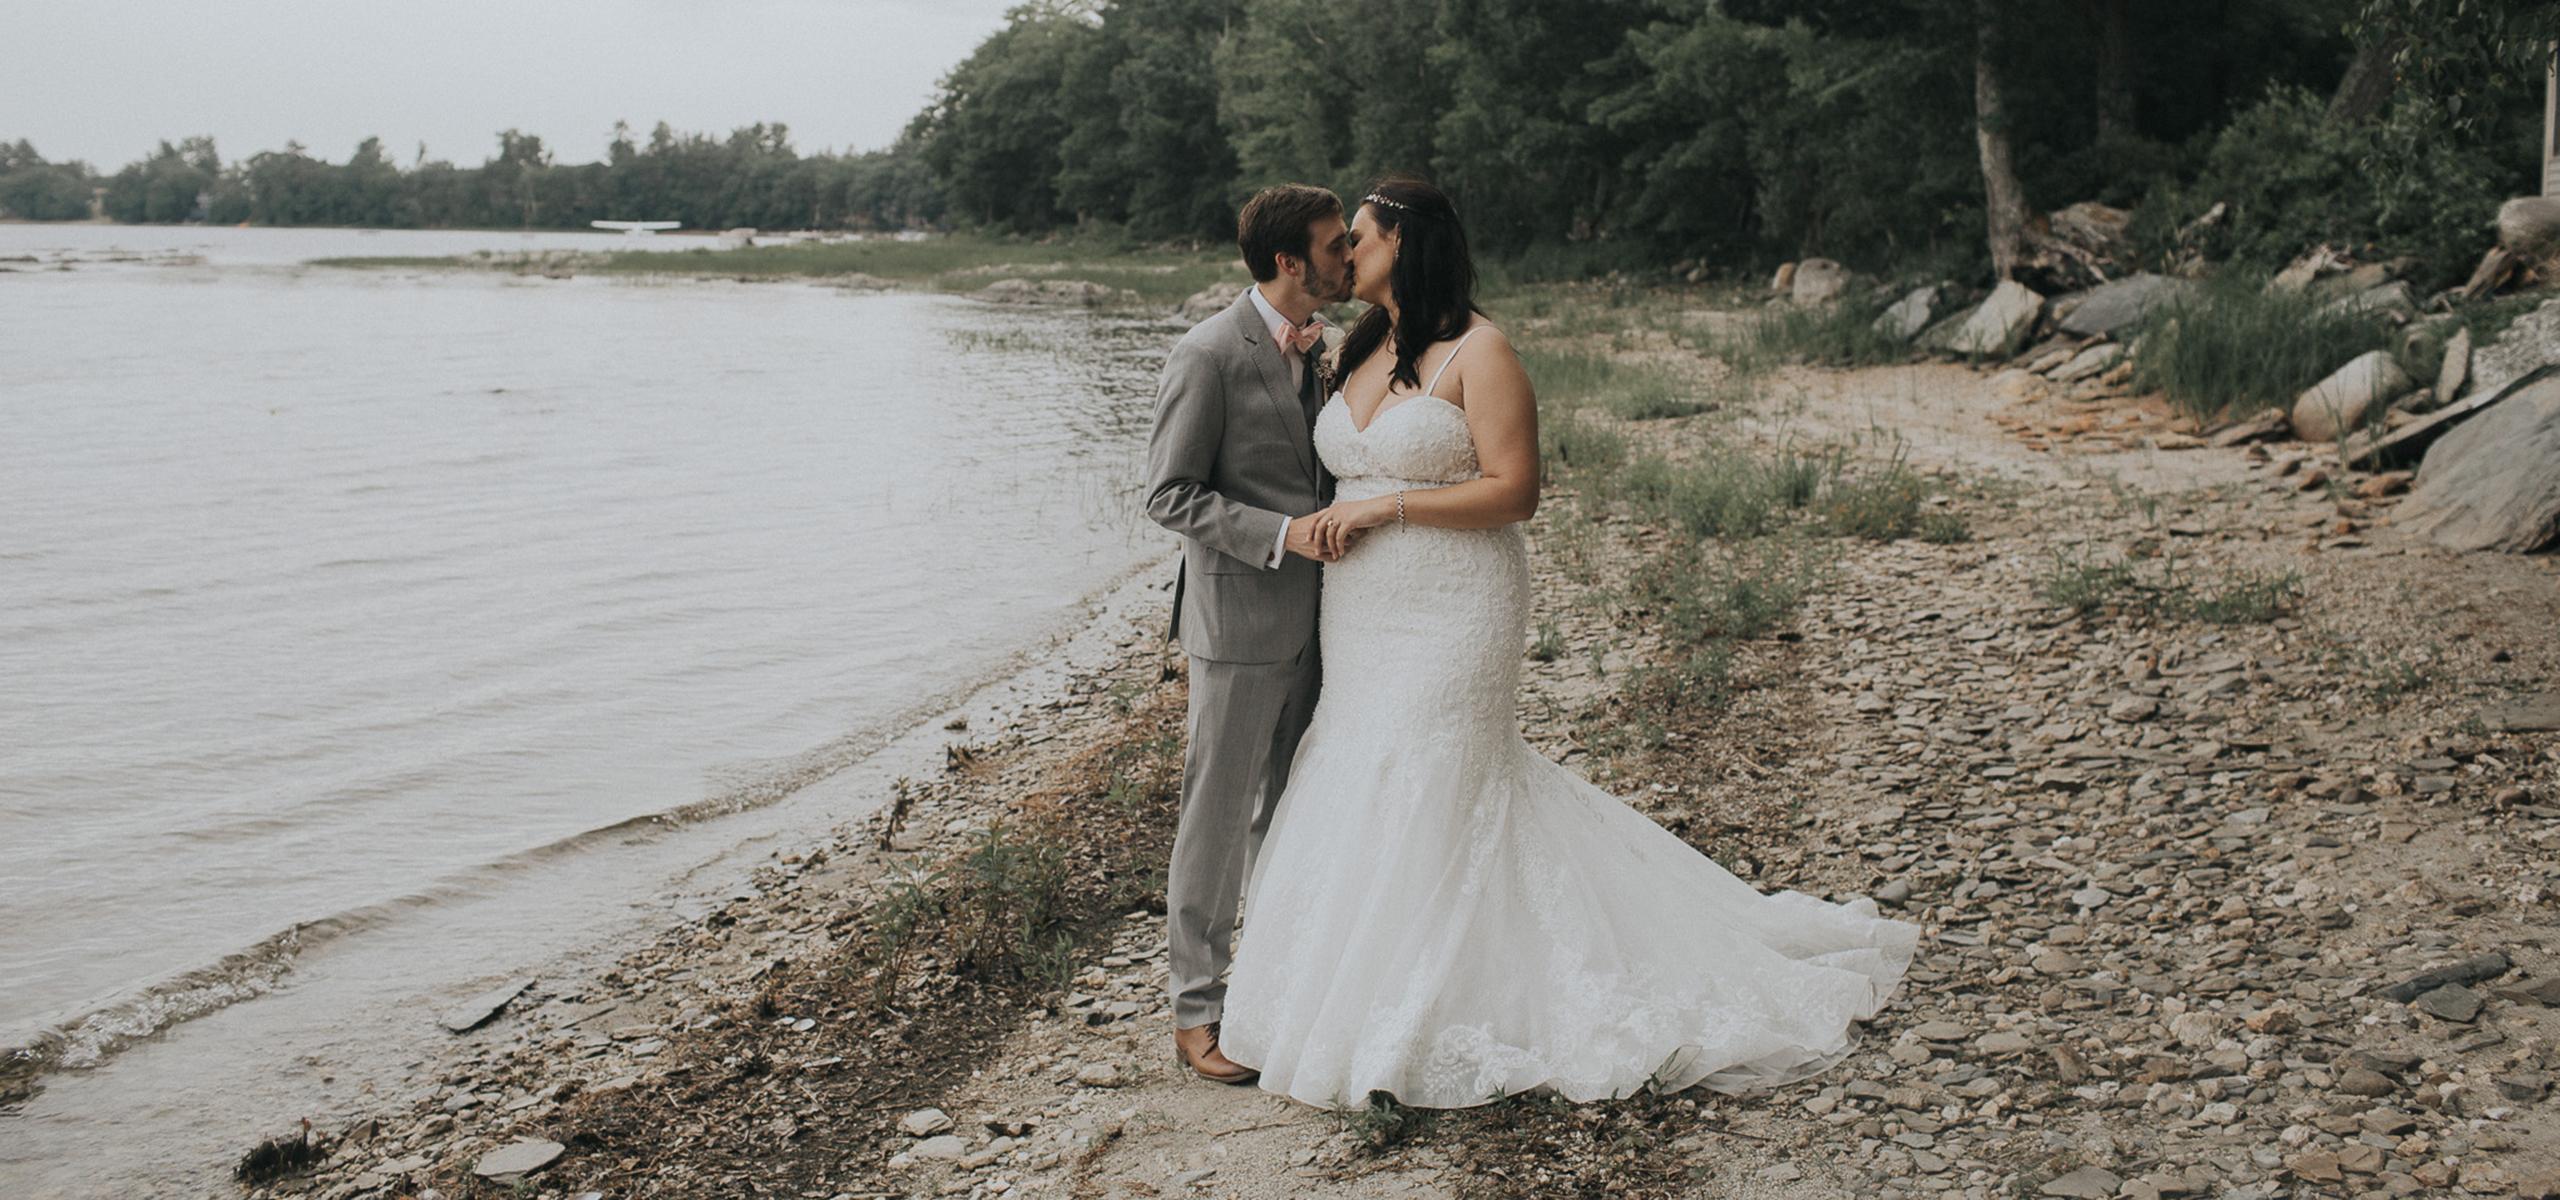 Bangor Maine Wedding Photography + Elopement Photography